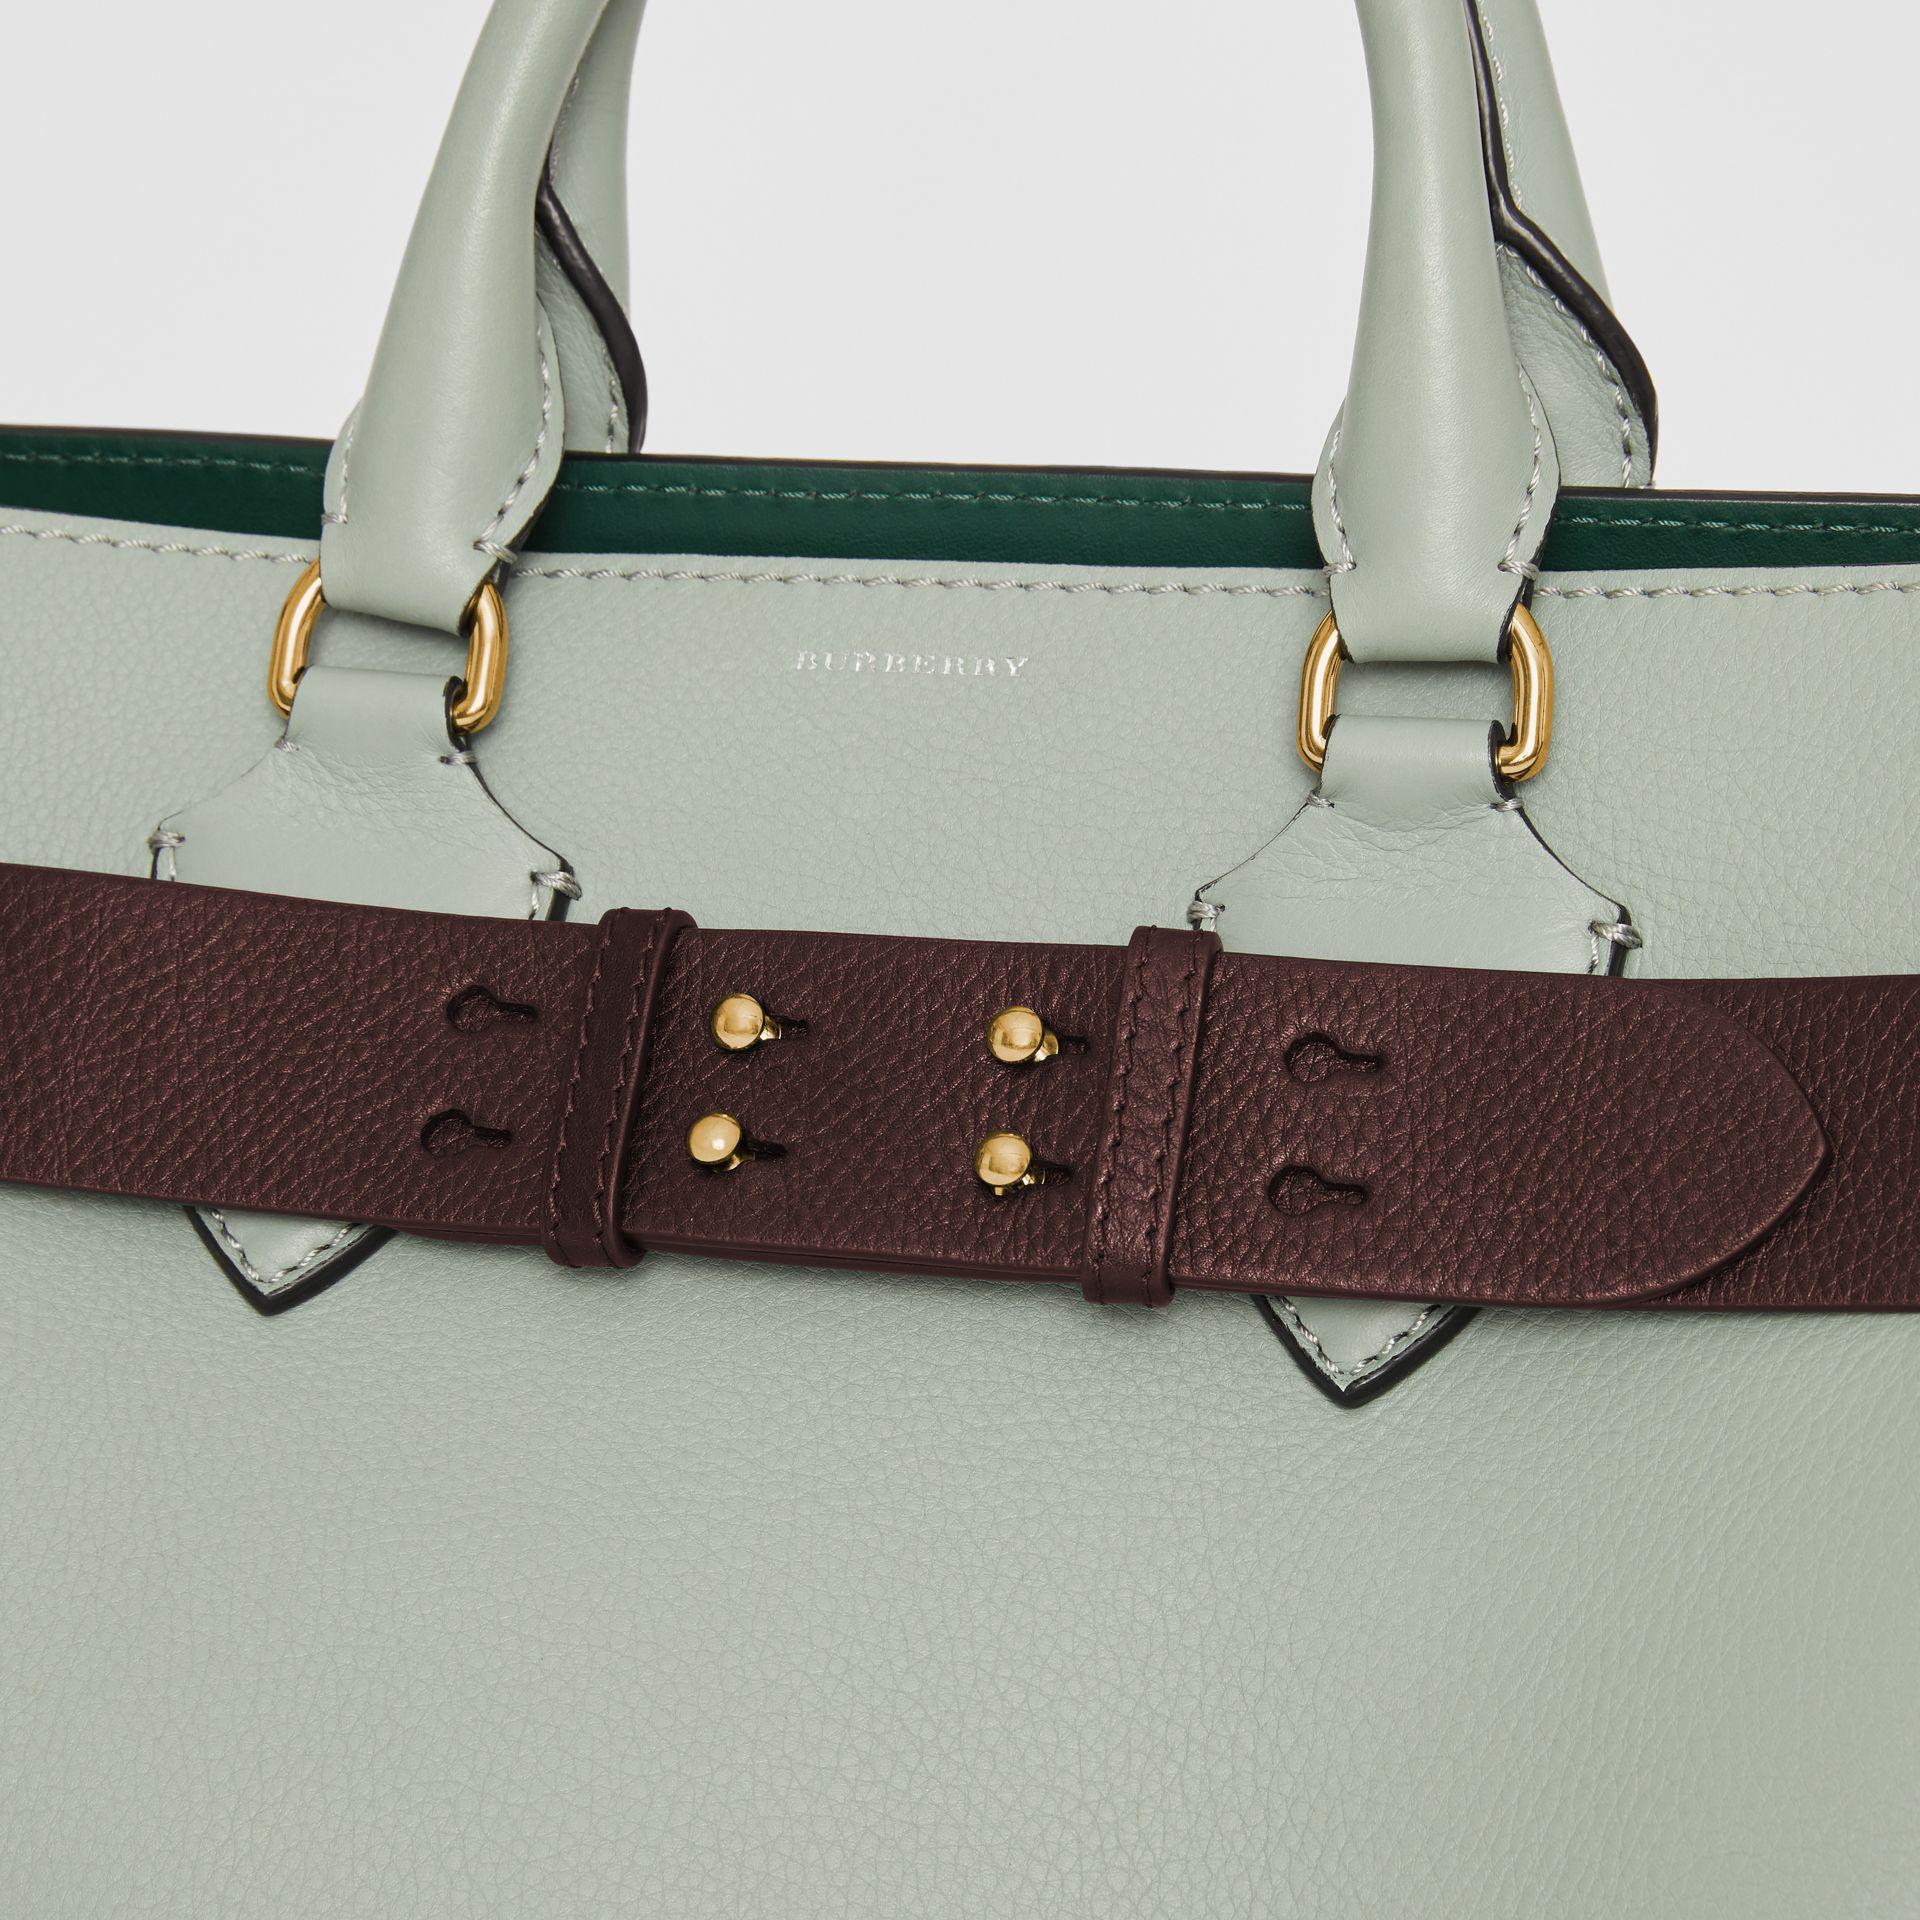 bfe50c2fa3fc Burberry - Multicolor The Medium Belt Bag Grainy Leather Belt - Lyst. View  fullscreen